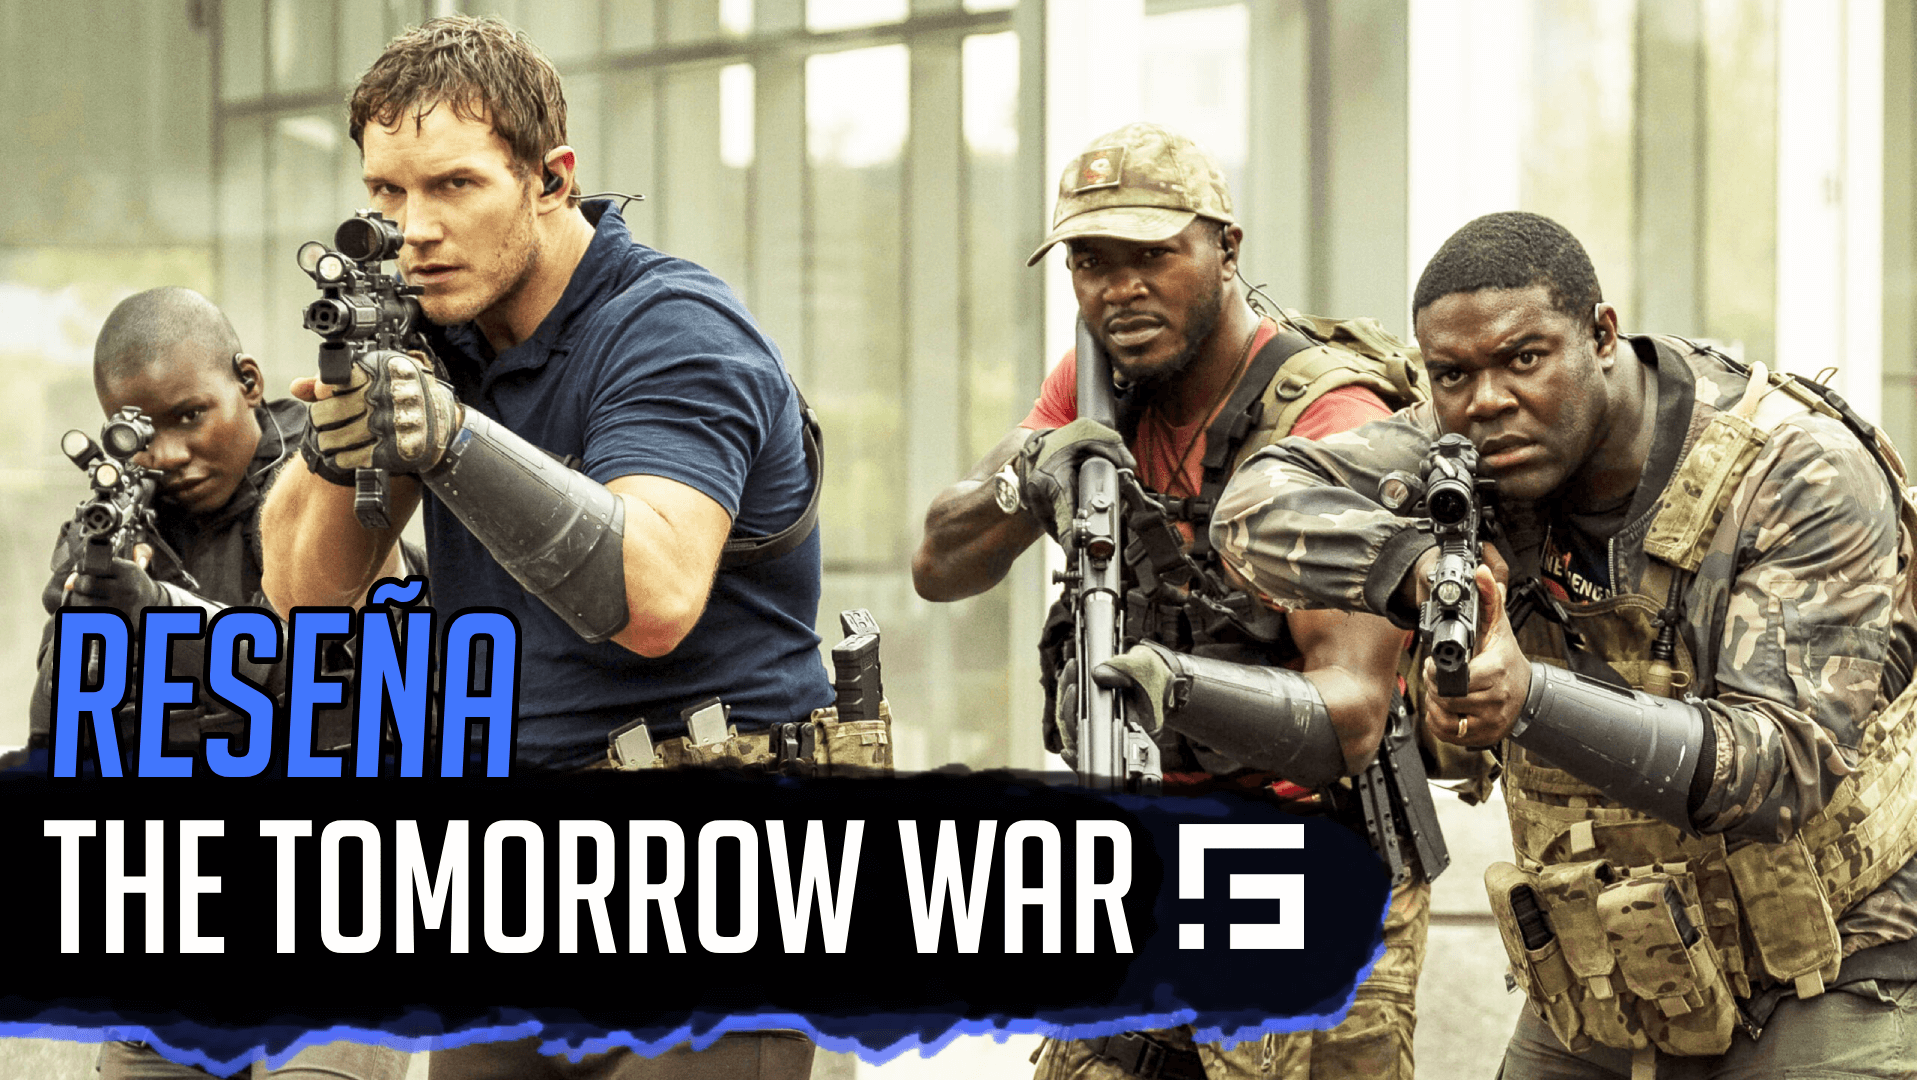 The Tomorrow War Reseña